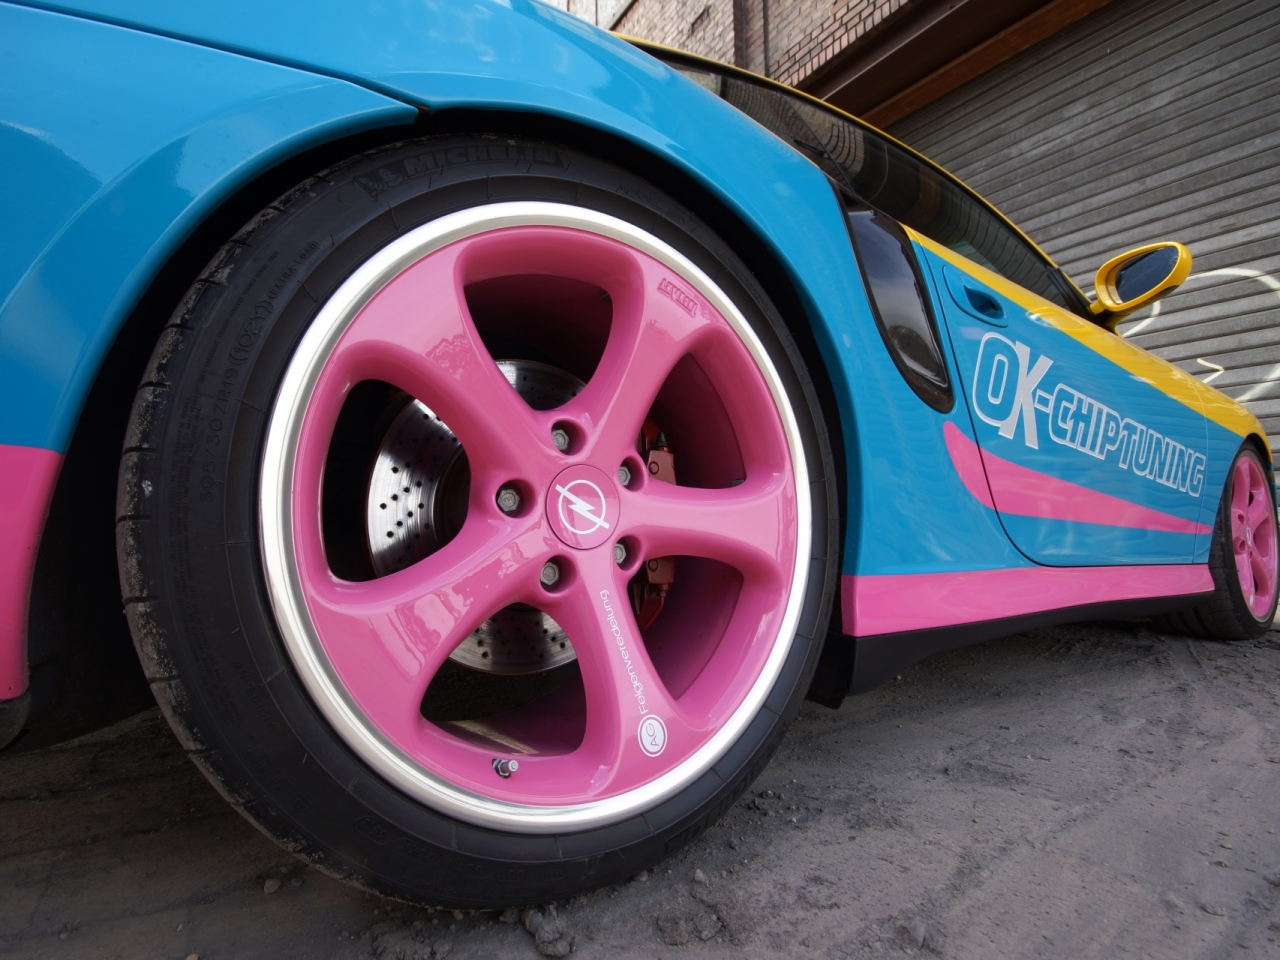 Un auto de colores - 1280x960